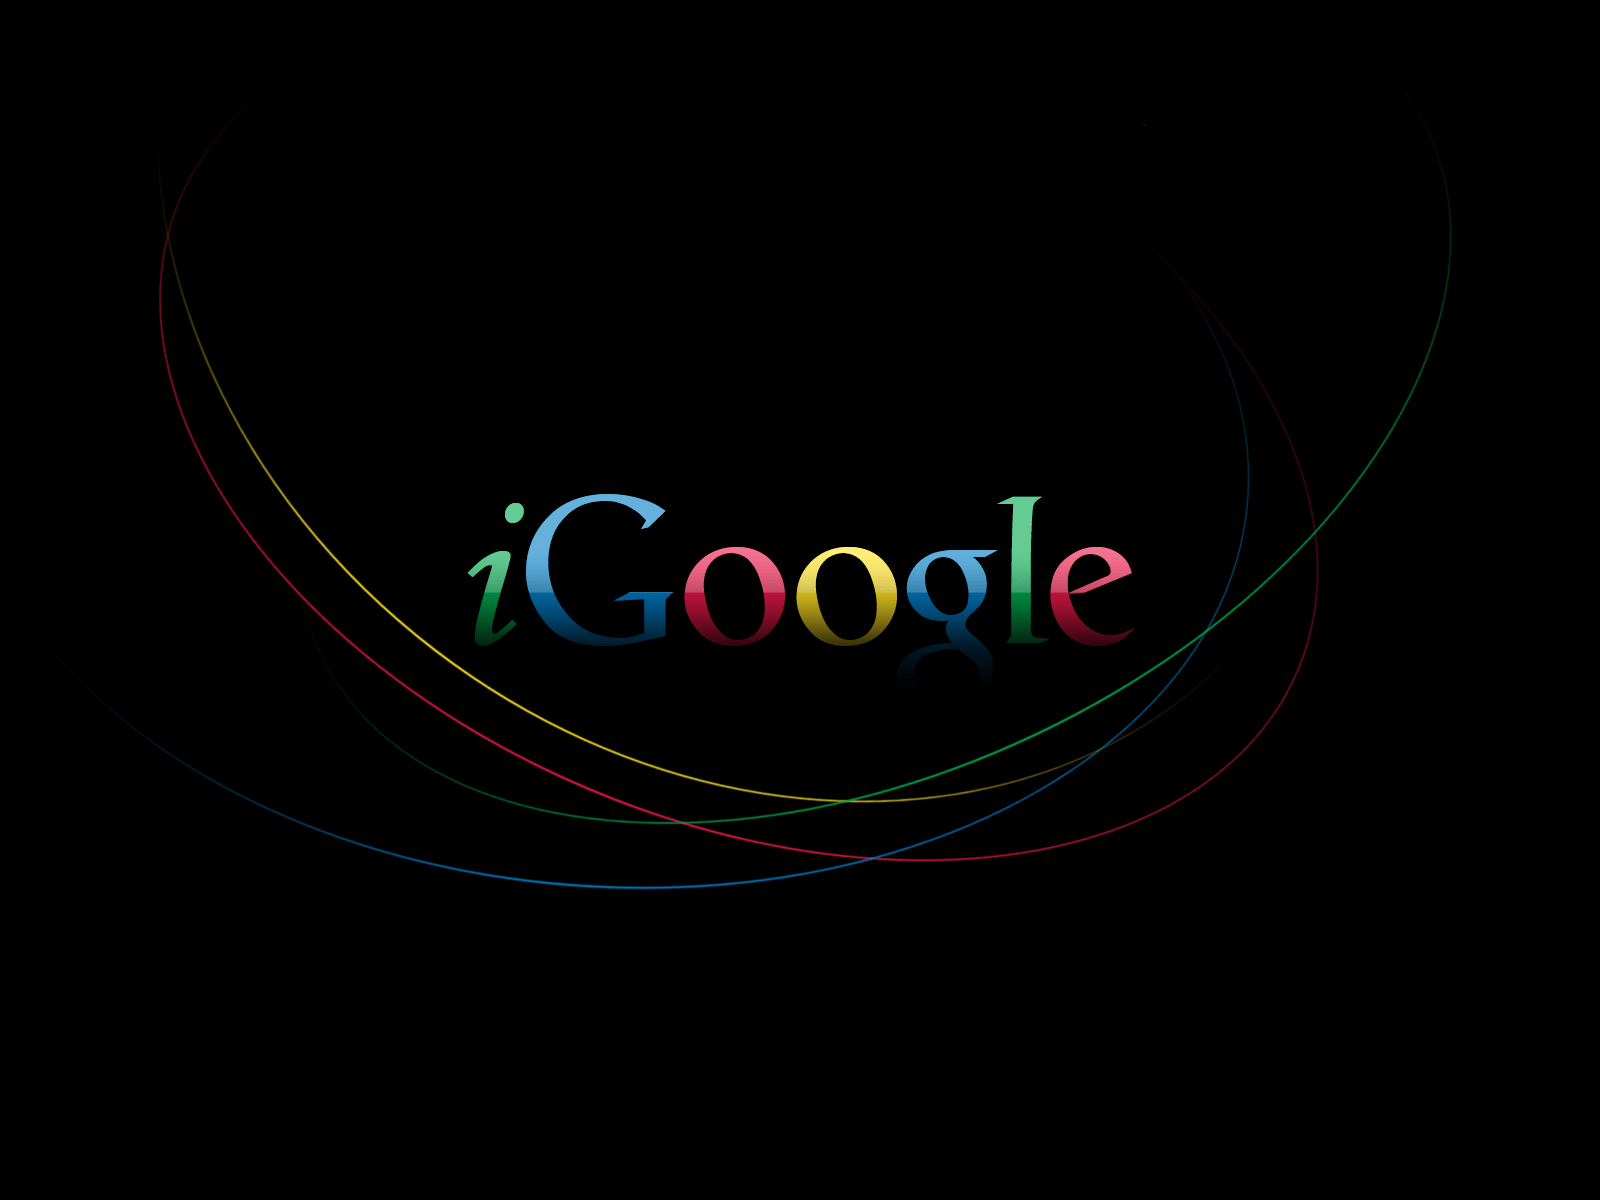 Google Wallpapers HD Wallpaper